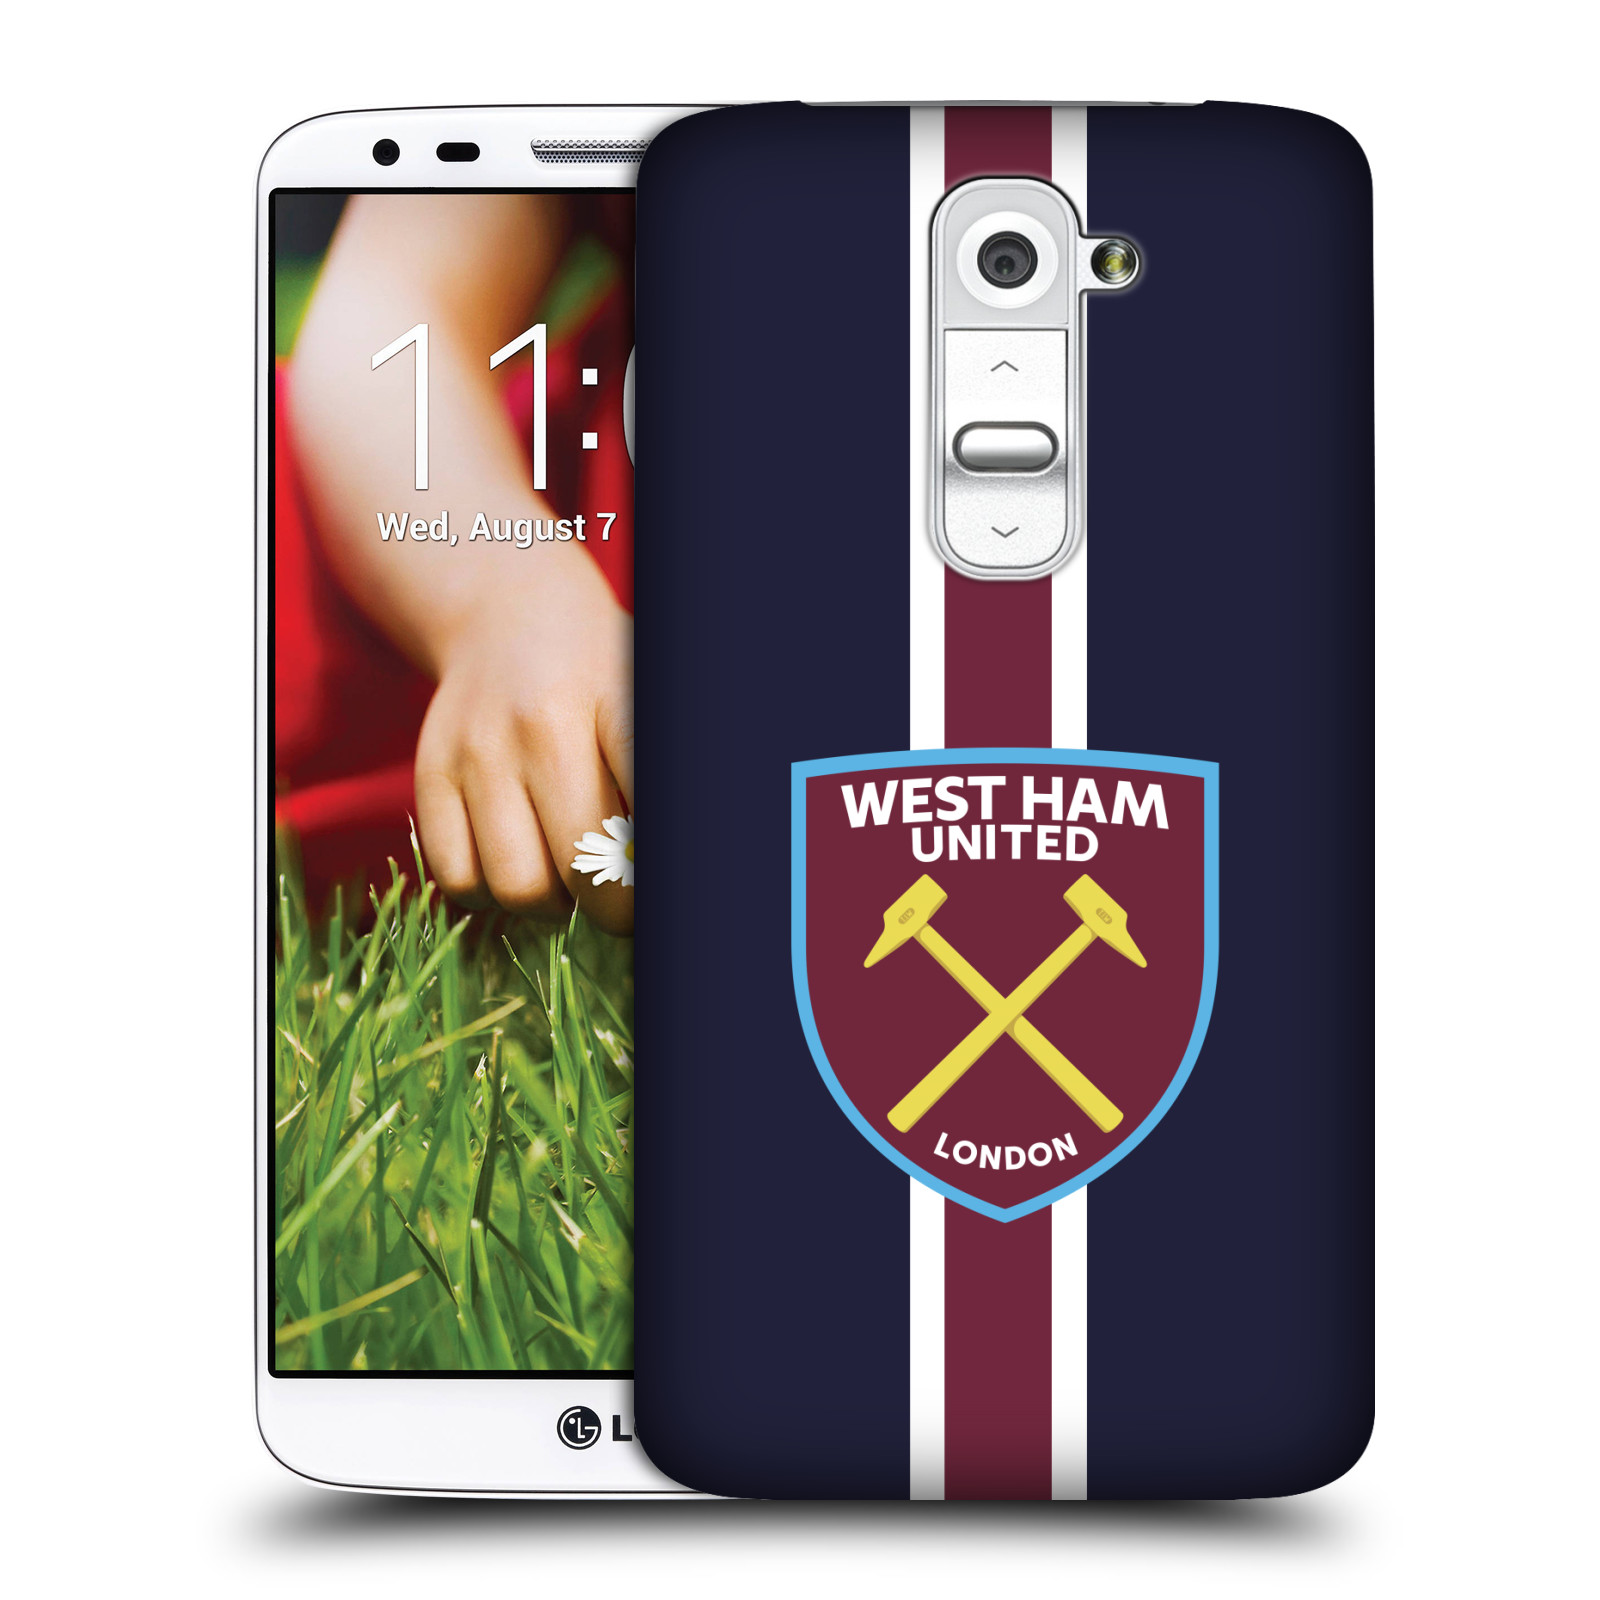 Plastové pouzdro na mobil LG G2 - Head Case - West Ham United - Pruhy